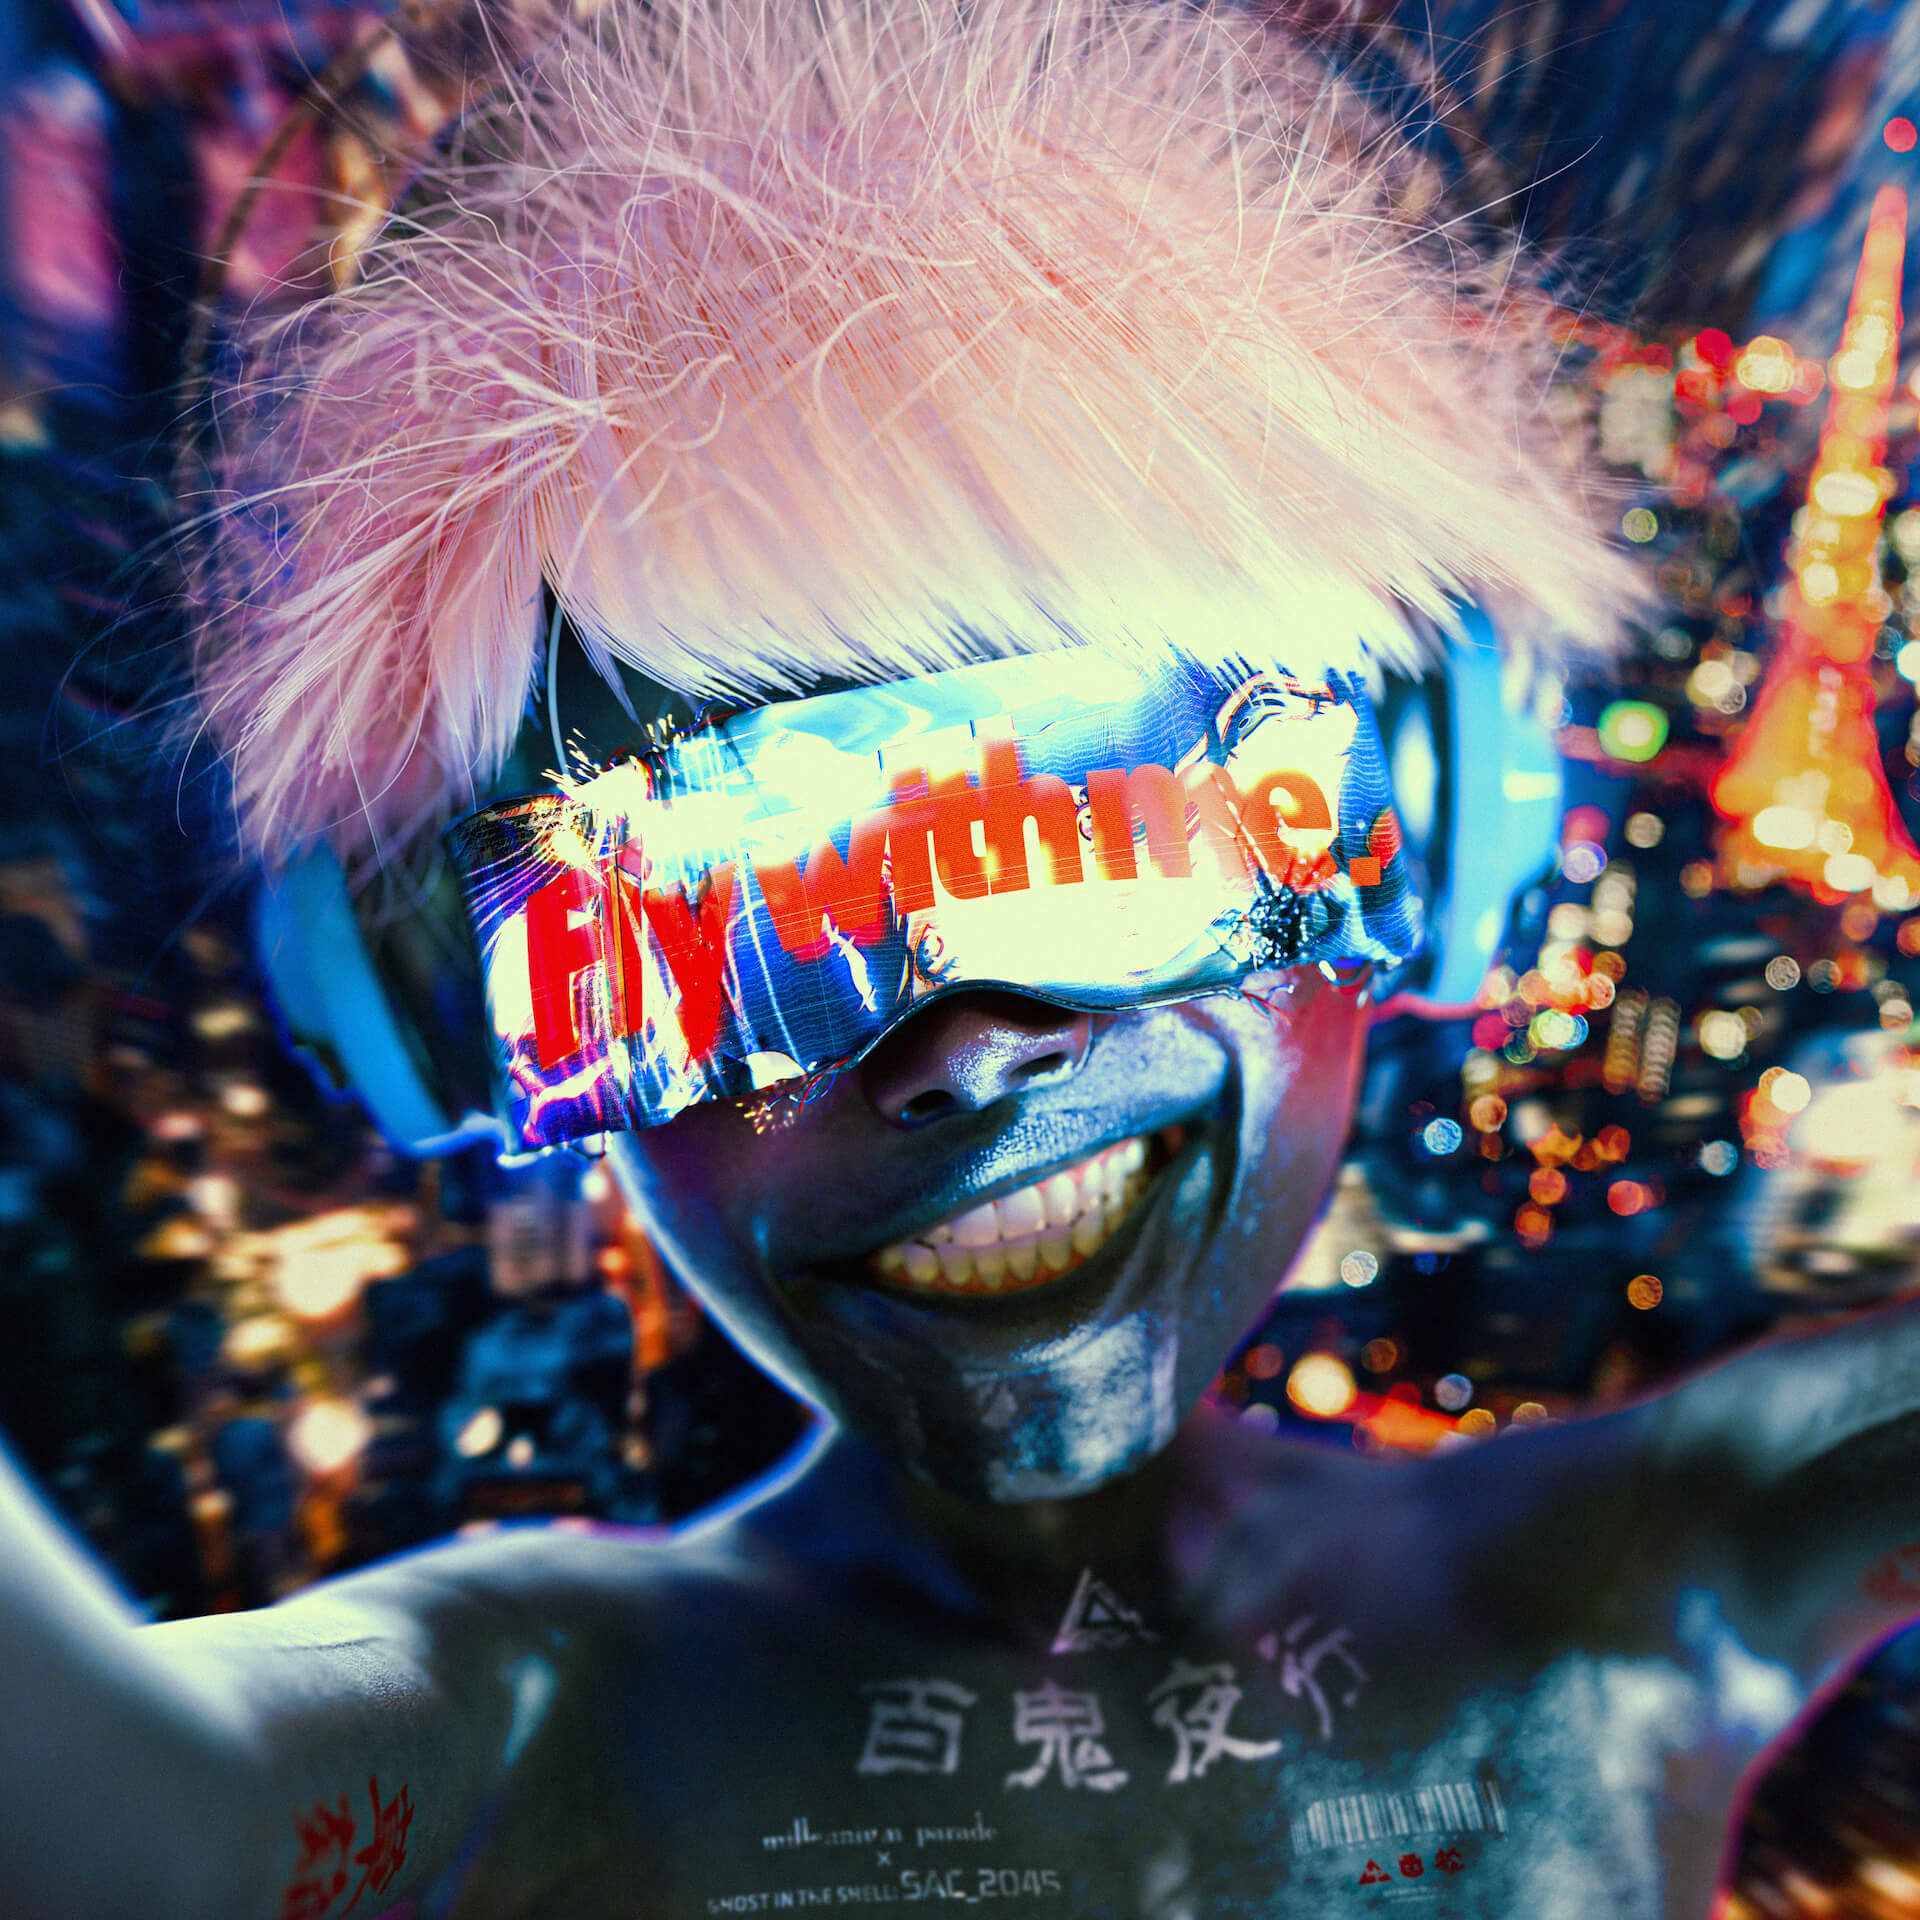 "millennium parade常田大希が電話で生出演!J-WAVE『SONAR MUSIC』で「攻殻機動隊」OPテーマ""Fly with me""初オンエア music200415_millenniumparade_3"